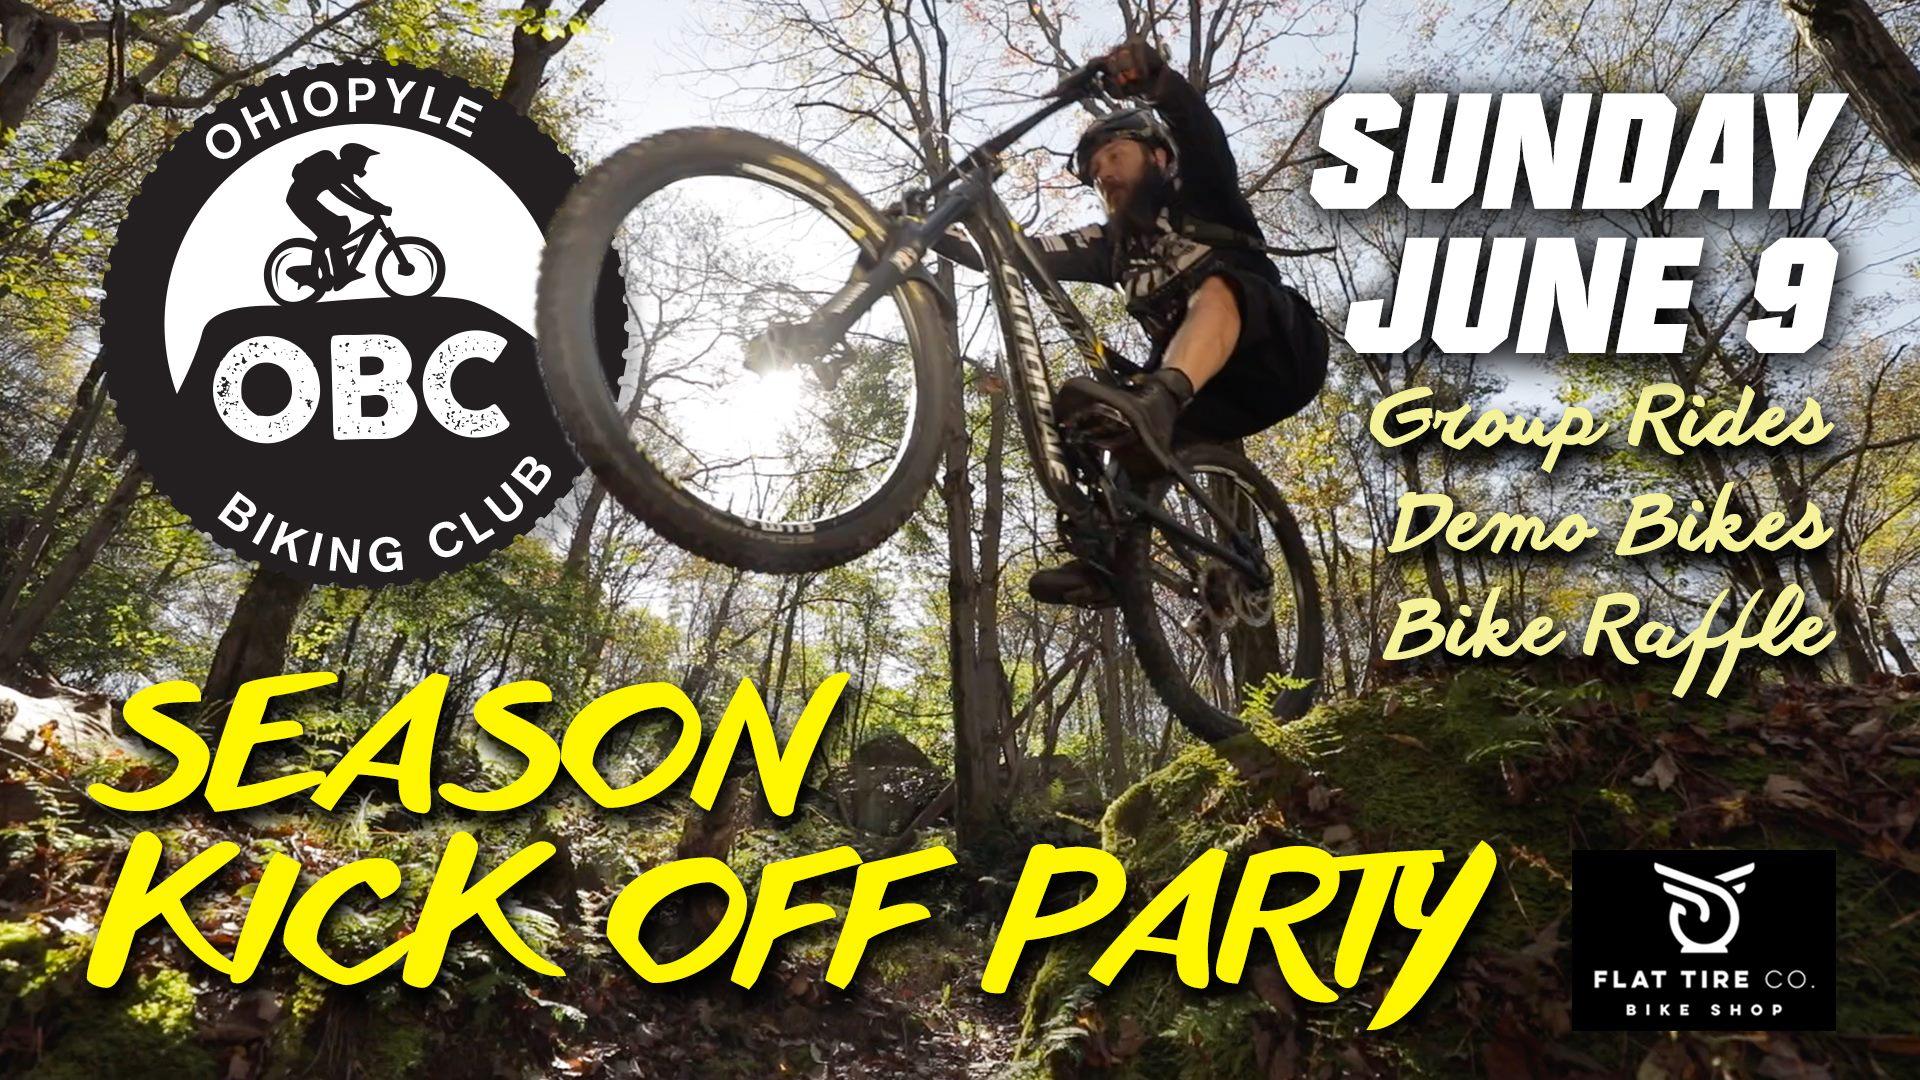 Ohiopyle Bike Demo + Group Rides — Flat Tire Co  Bike Shop